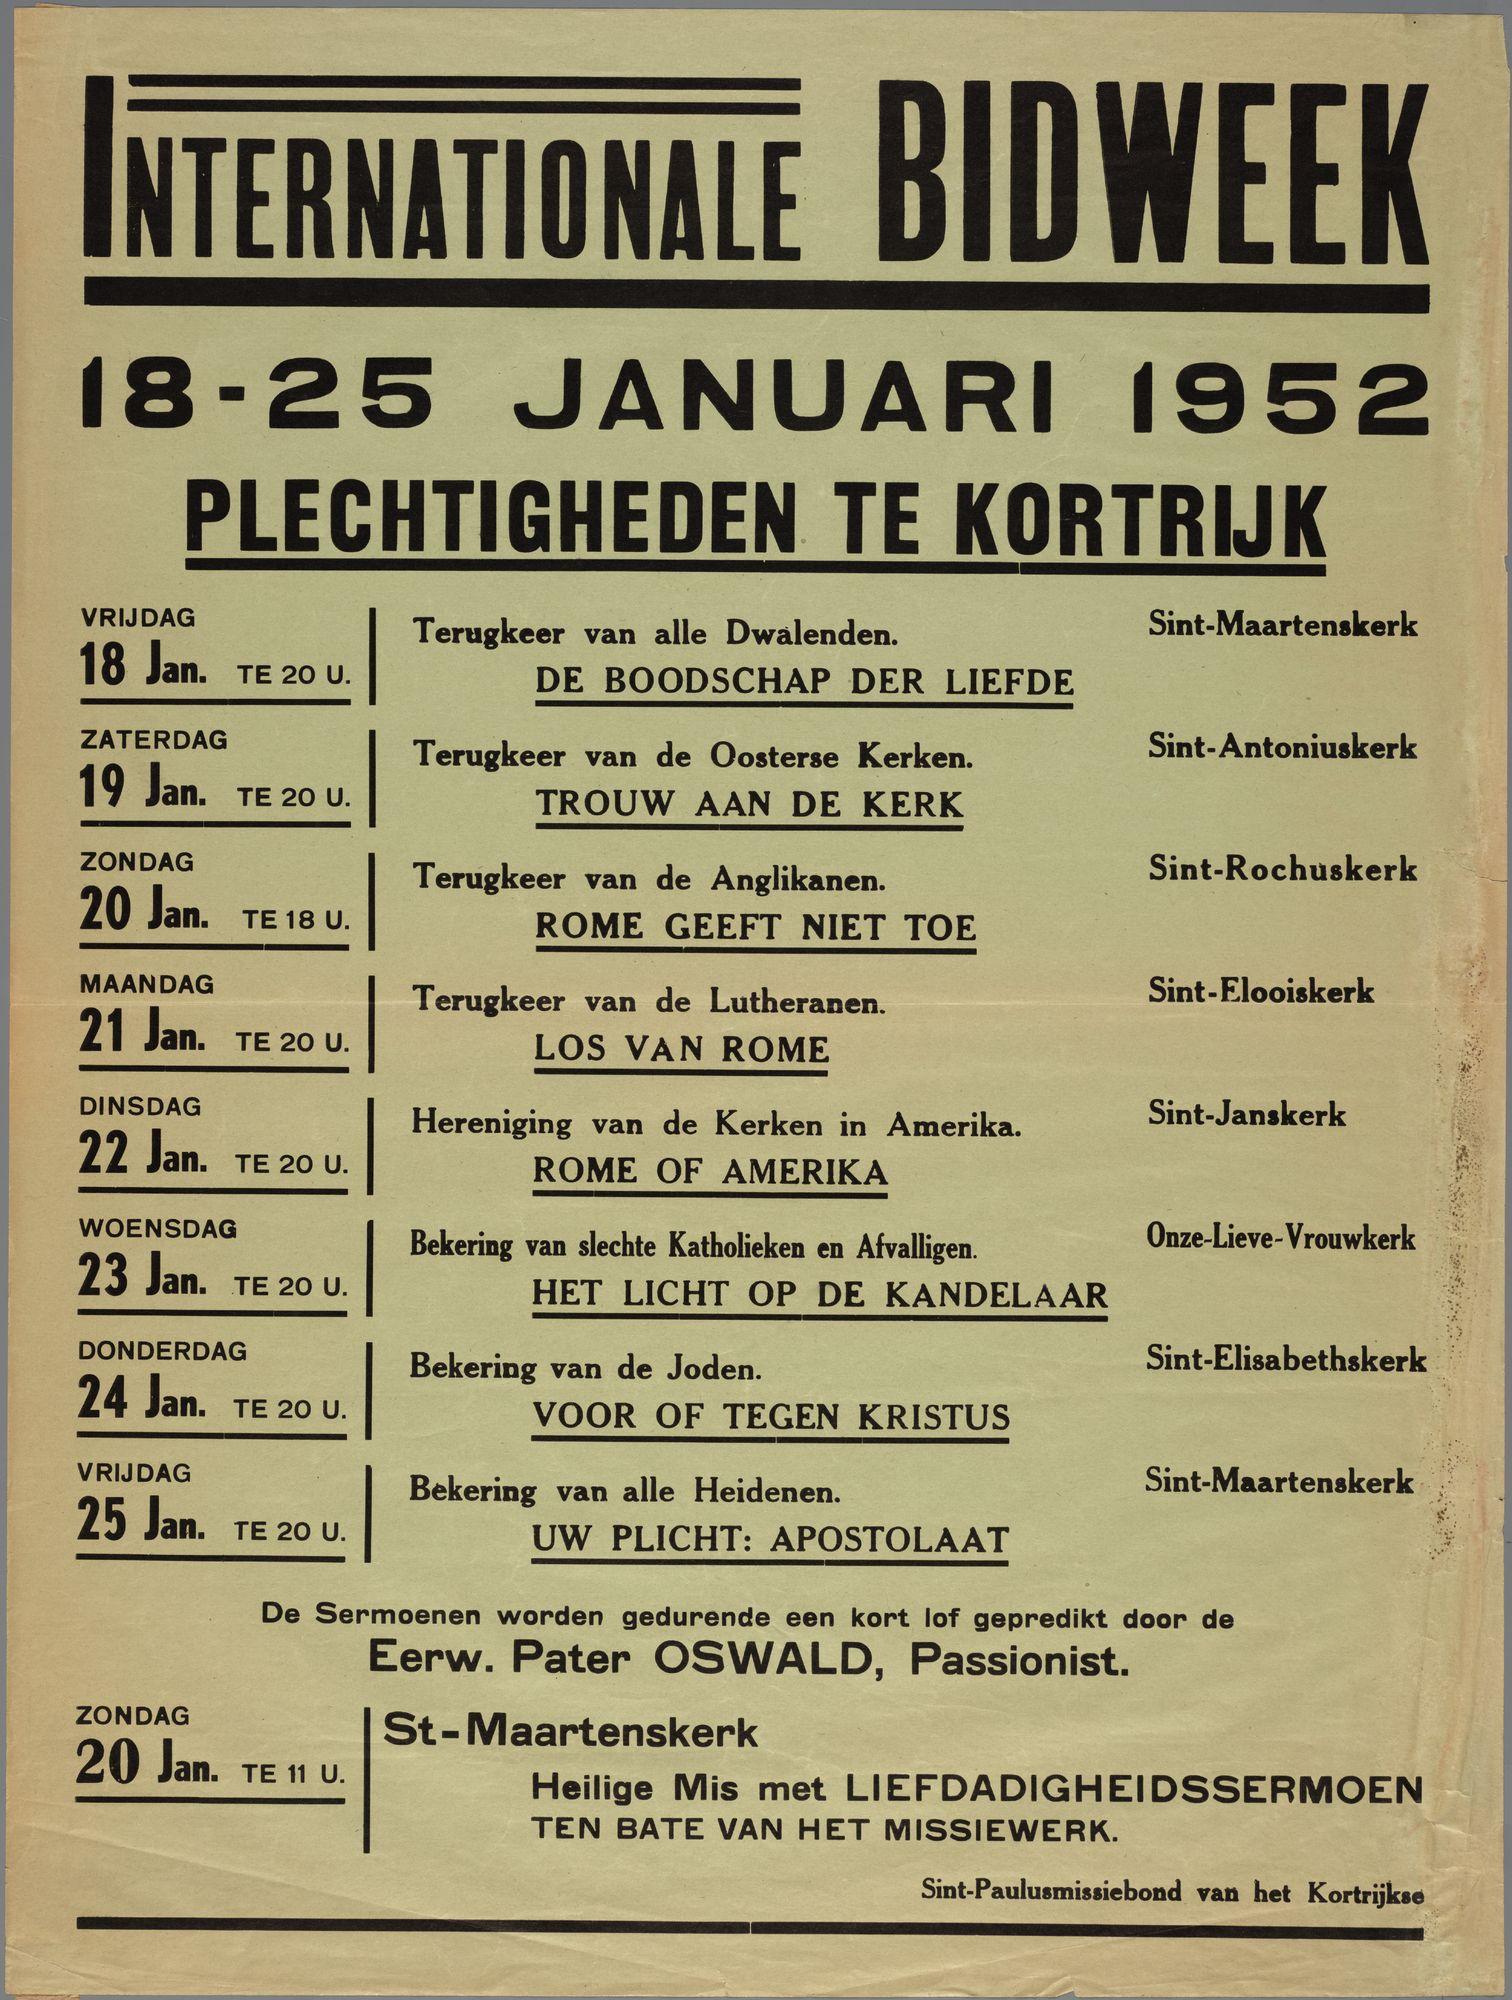 Internationale Bidweek 1952